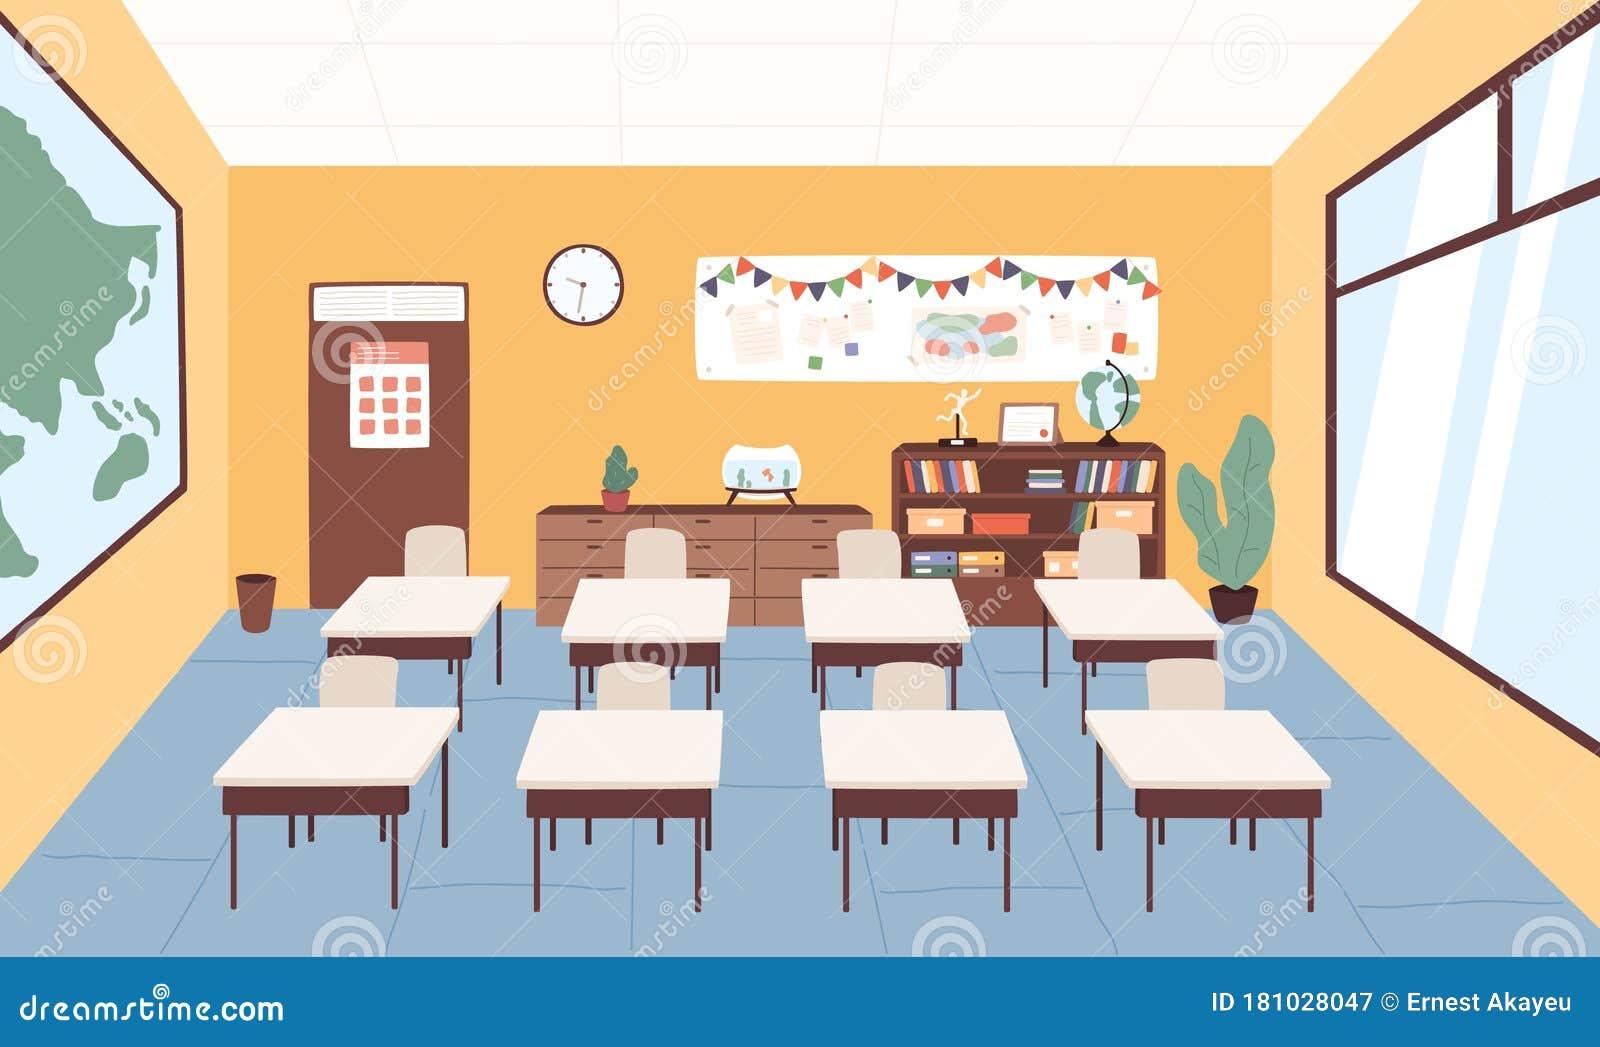 Empty Classroom At Primary School Vector Graphic Illustration Interior Of Cartoon Elementary Studying Room With Desk Stock Vector Illustration Of Cartoon Flat 181028047,Scandinavian Design Desktop Wallpaper